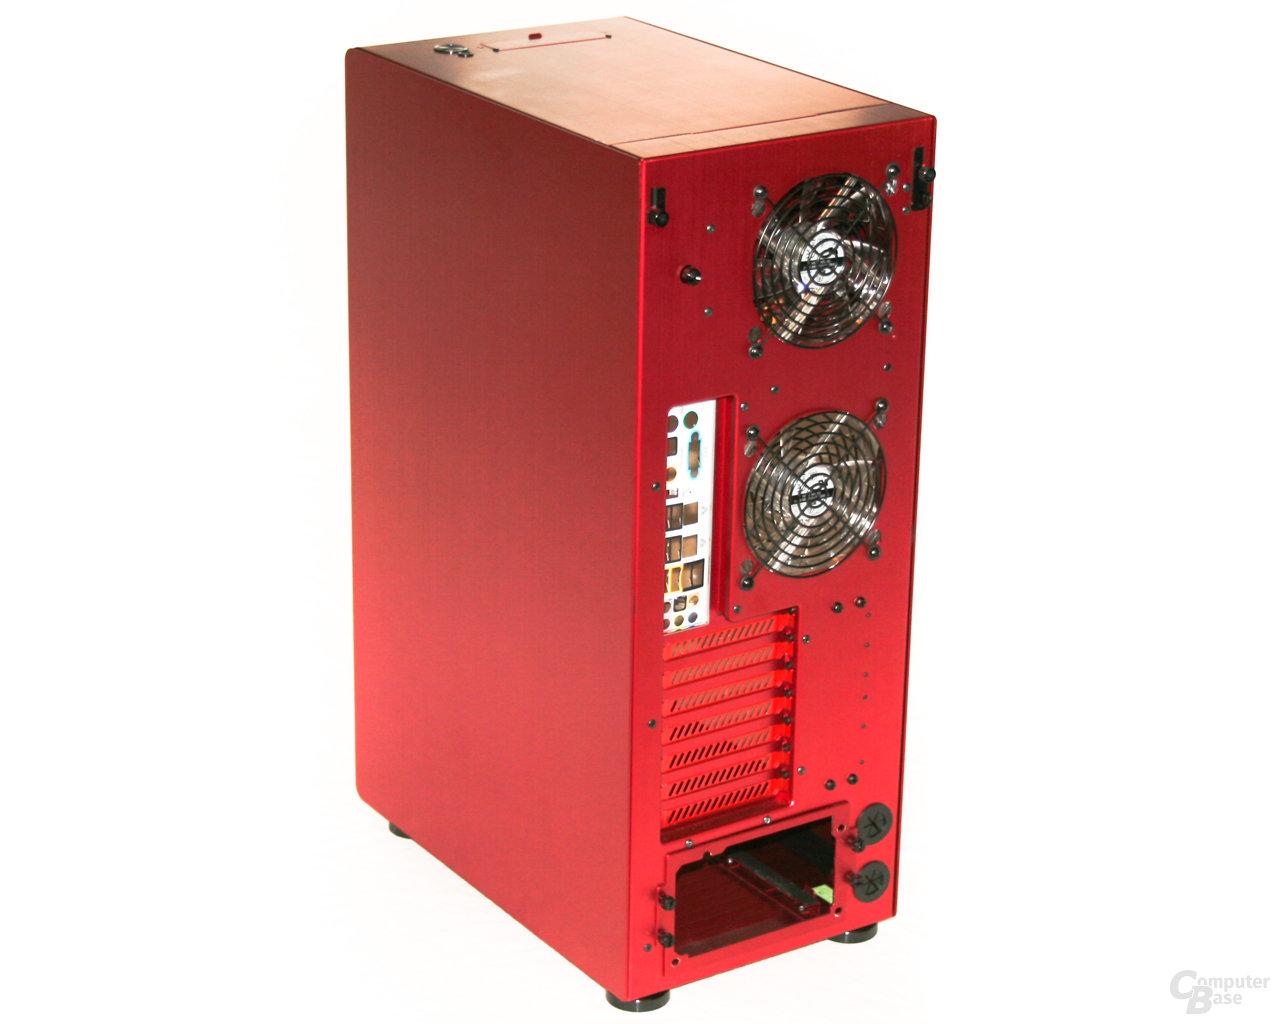 Lian Li PC-X900R – Rückseite rechts